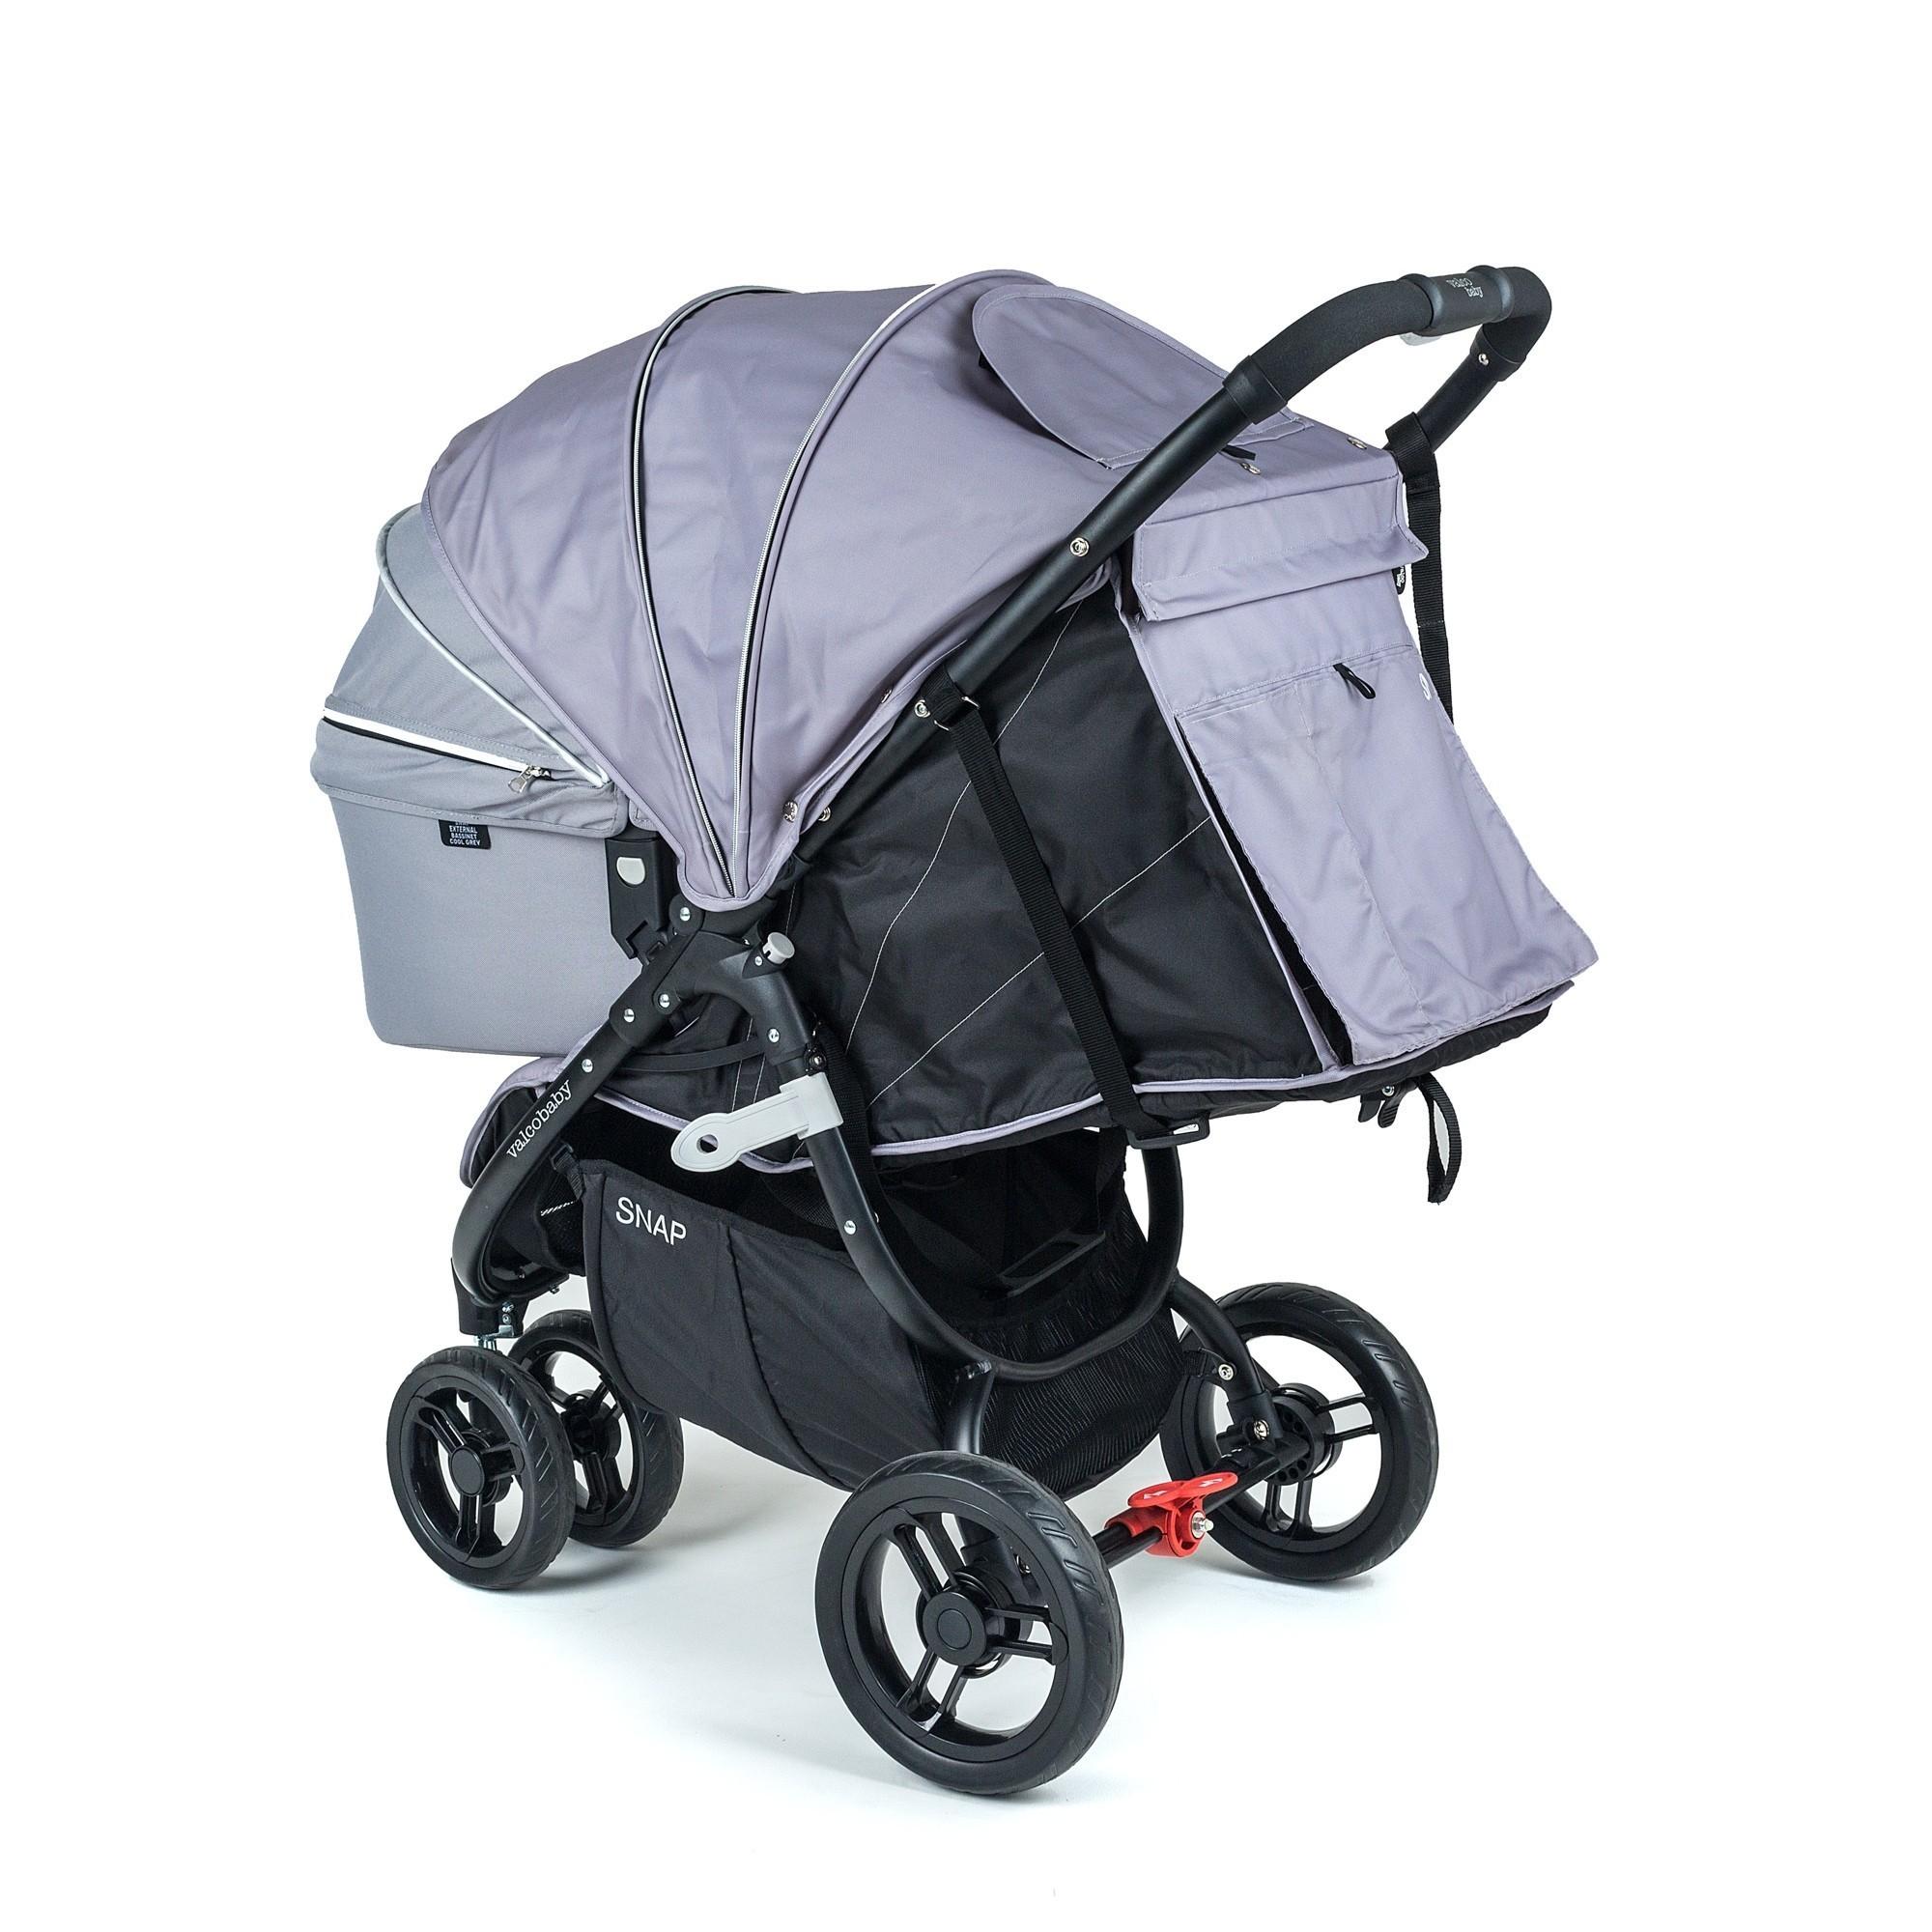 Люлька Valco baby External Bassinet для Snap & Snap4 / Cool Grey